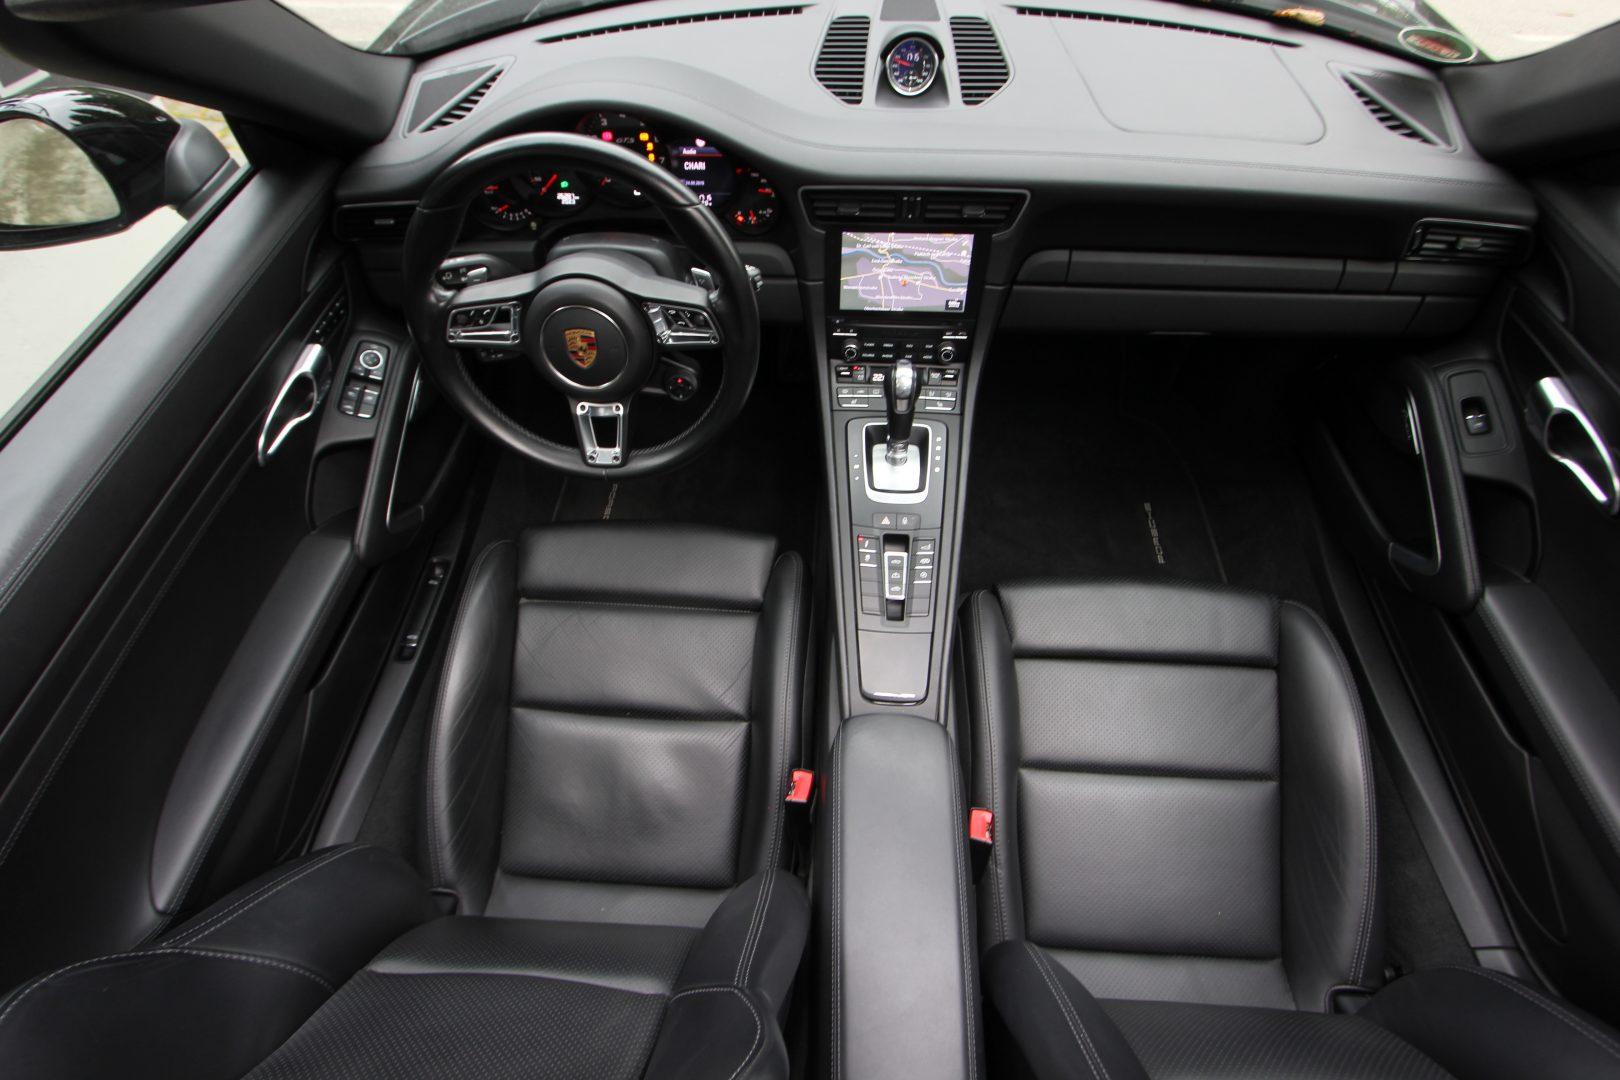 AIL Porsche 991 4 GTS Cabriolet LED Burmester High-End 10